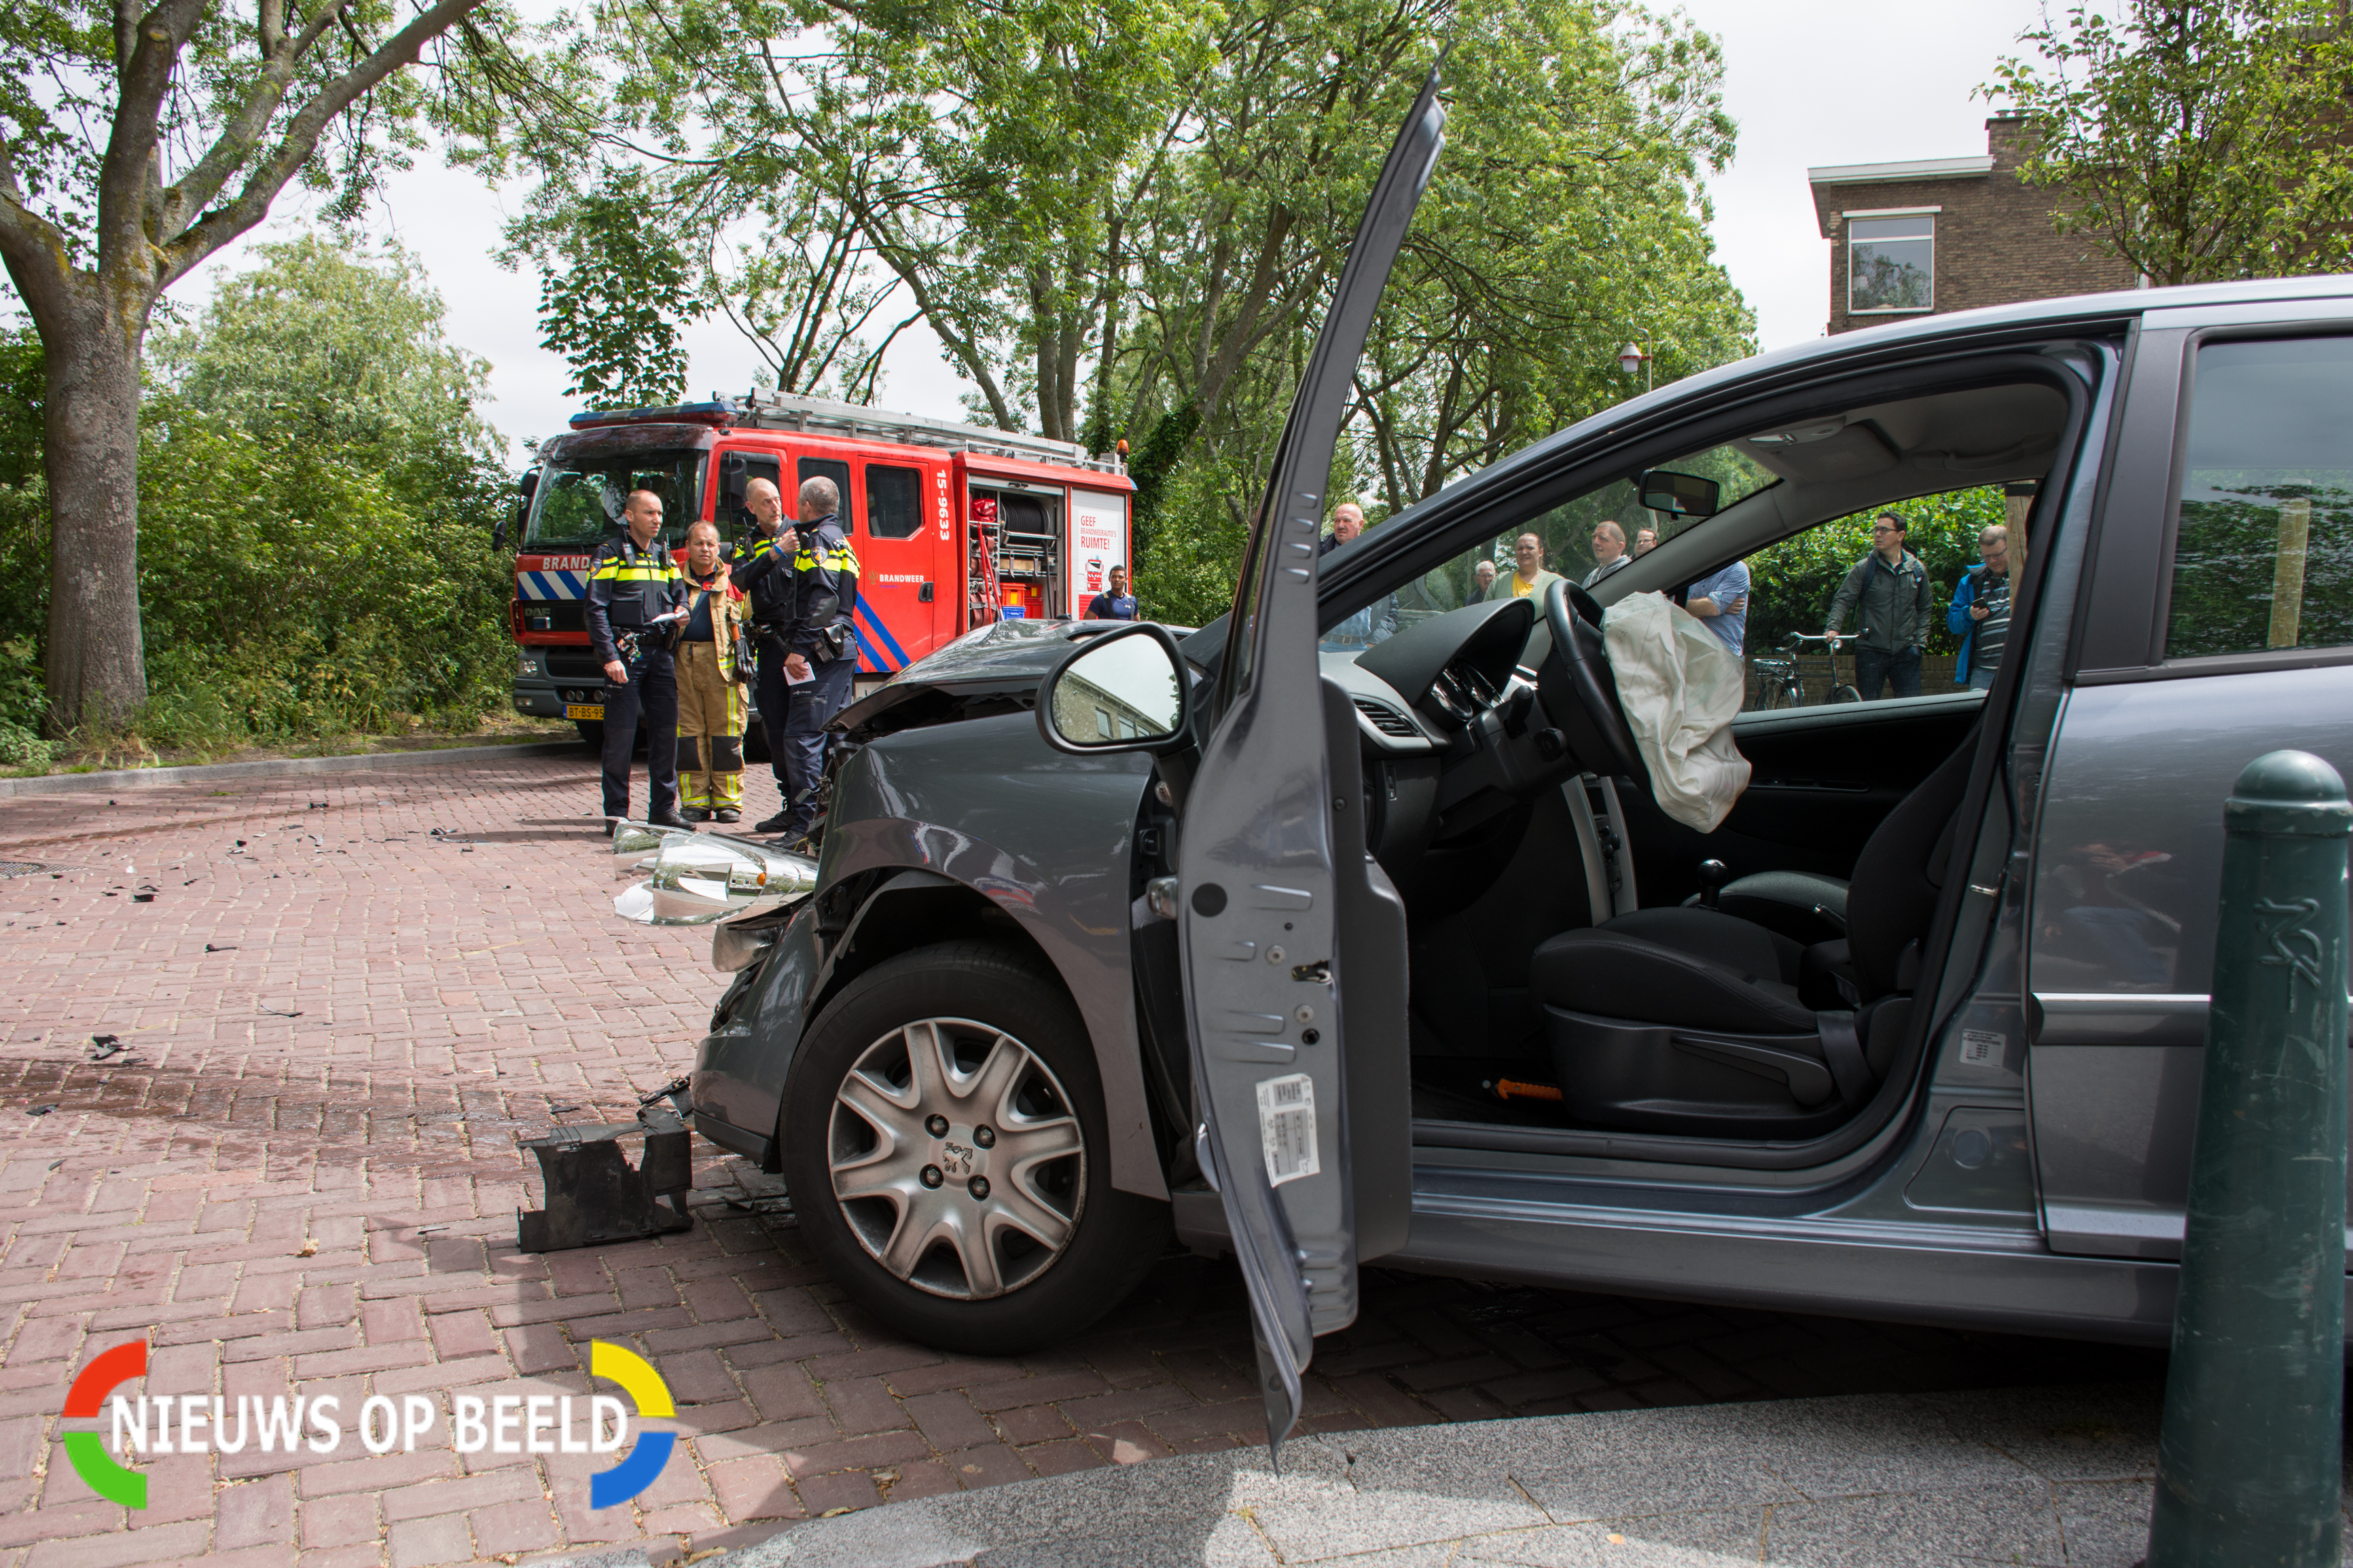 3a478aba78e6b9 Ravage na ongeval uit onverwachte hoek – Nieuws op Beeld – Altijd ...